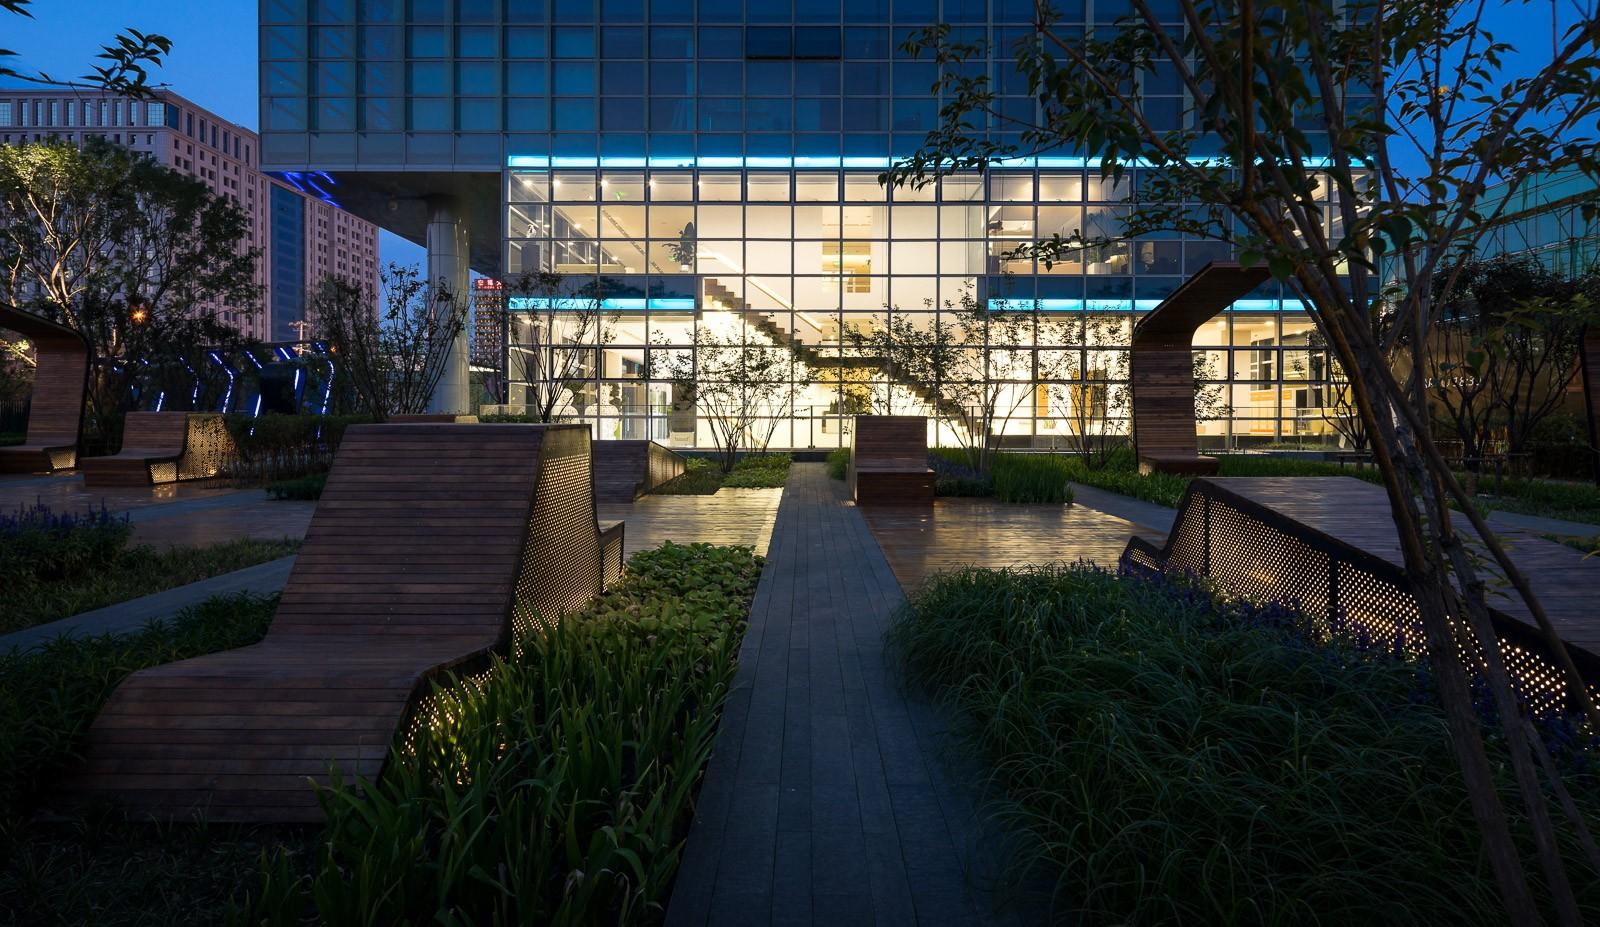 Technology Business District Green Design Landscape Architecture